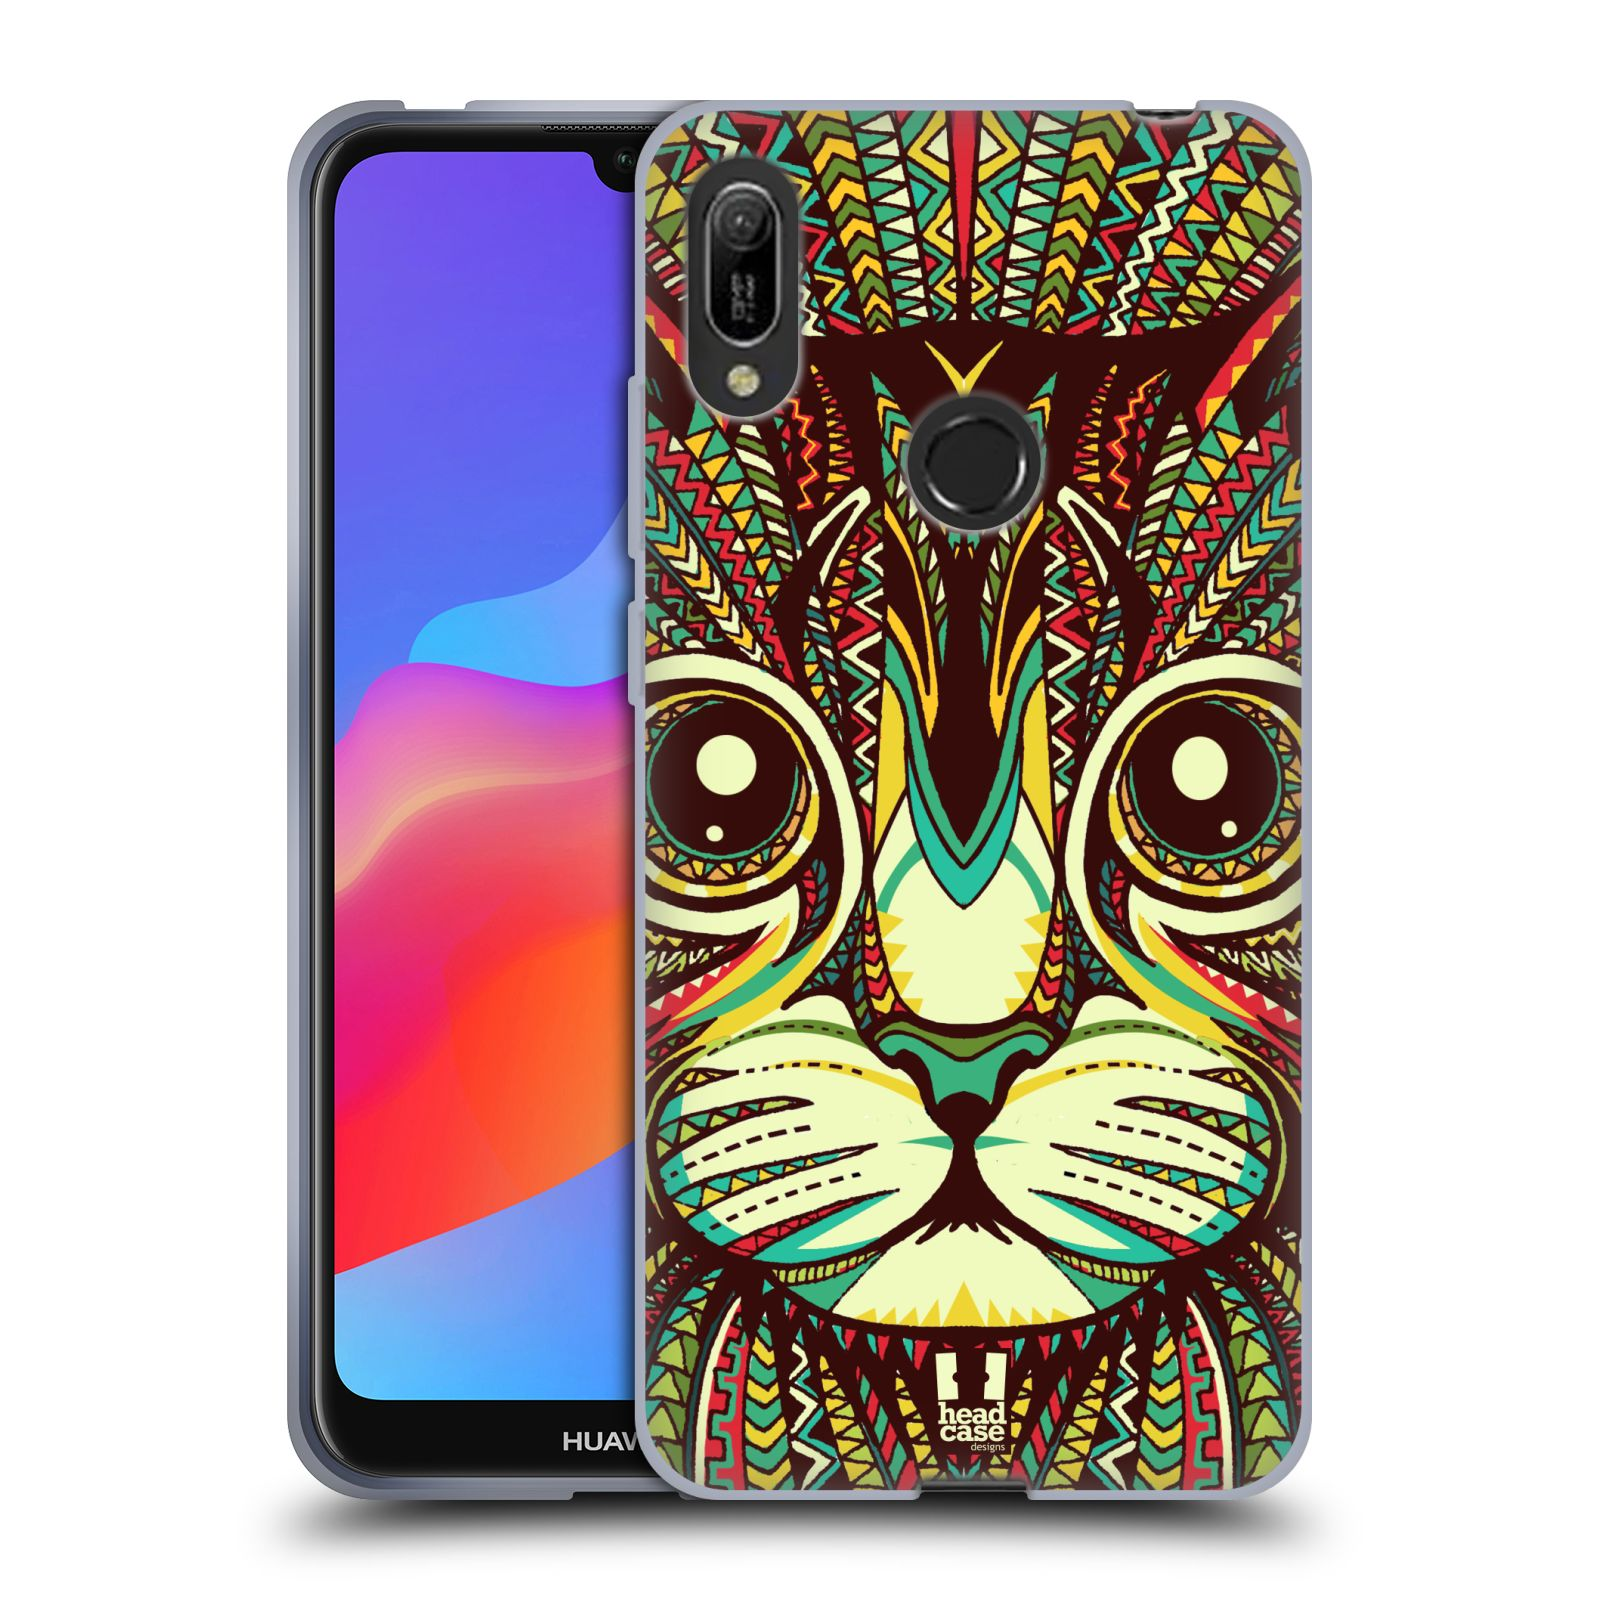 Silikonové pouzdro na mobil Huawei Y6 (2019) - Head Case - AZTEC KOČKA